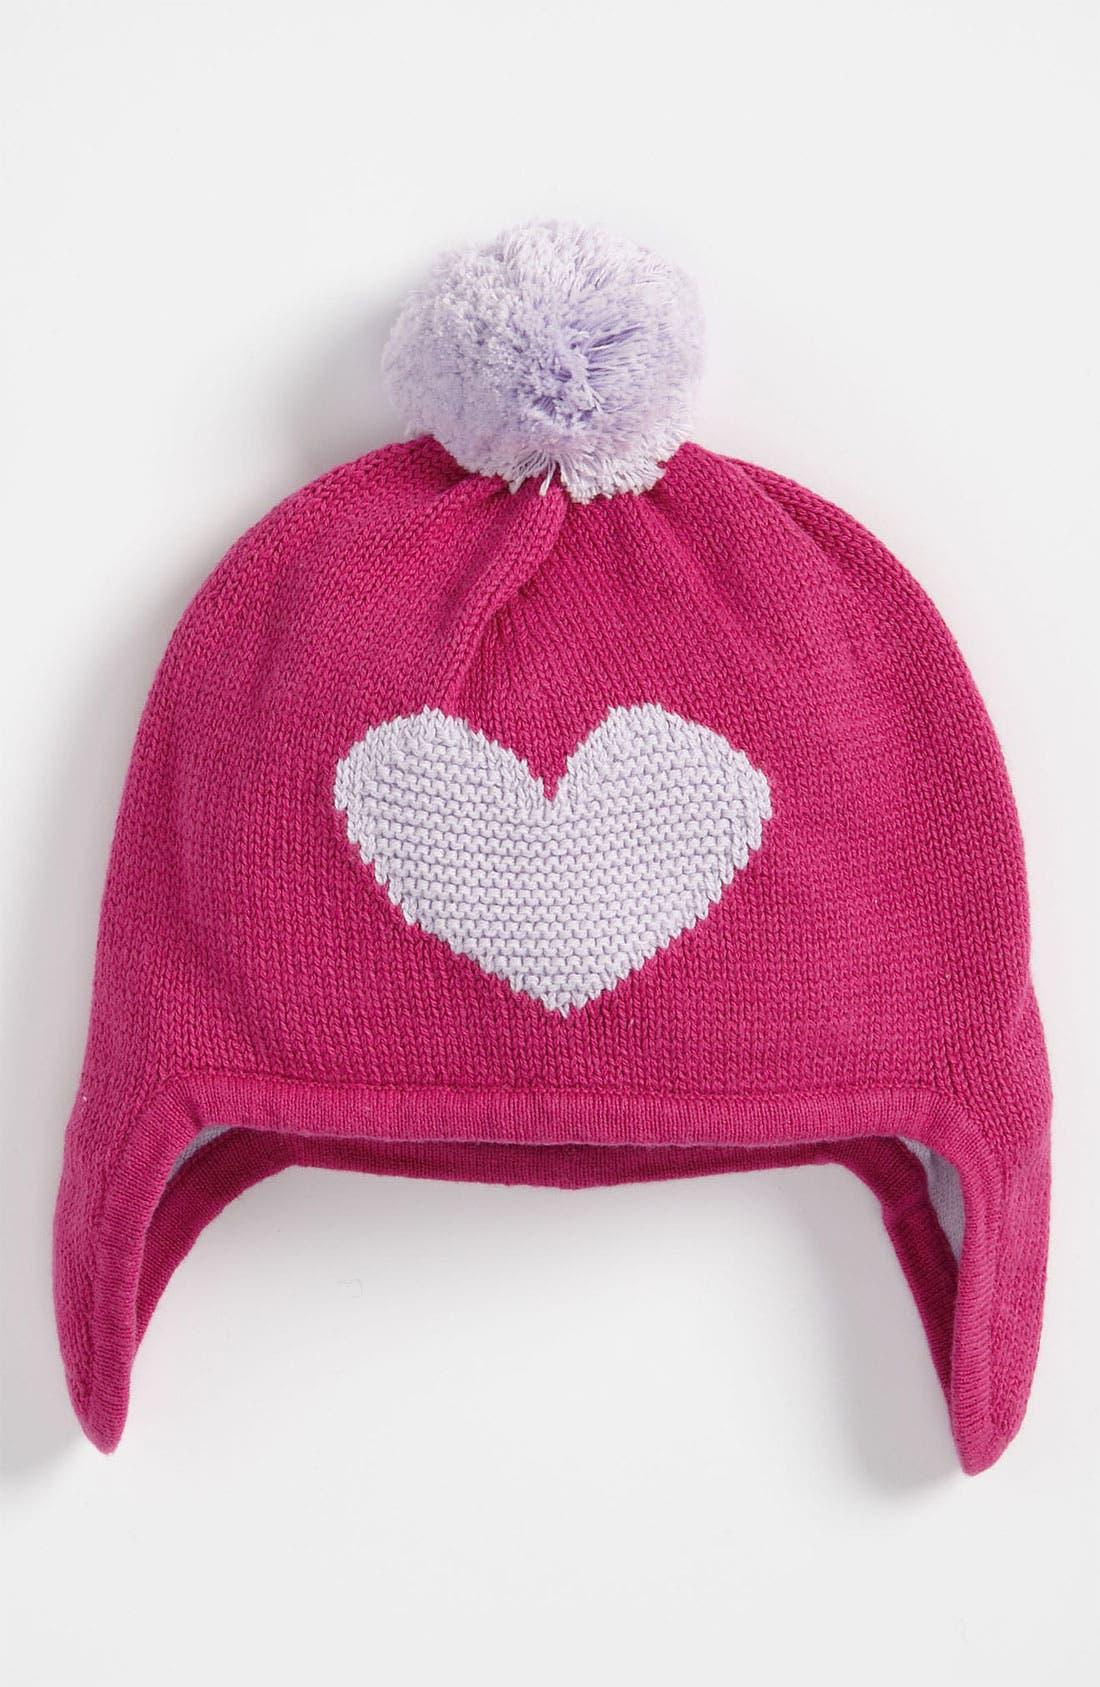 Alternate Image 1 Selected - Nordstrom Baby Earflap Hat (Infant)